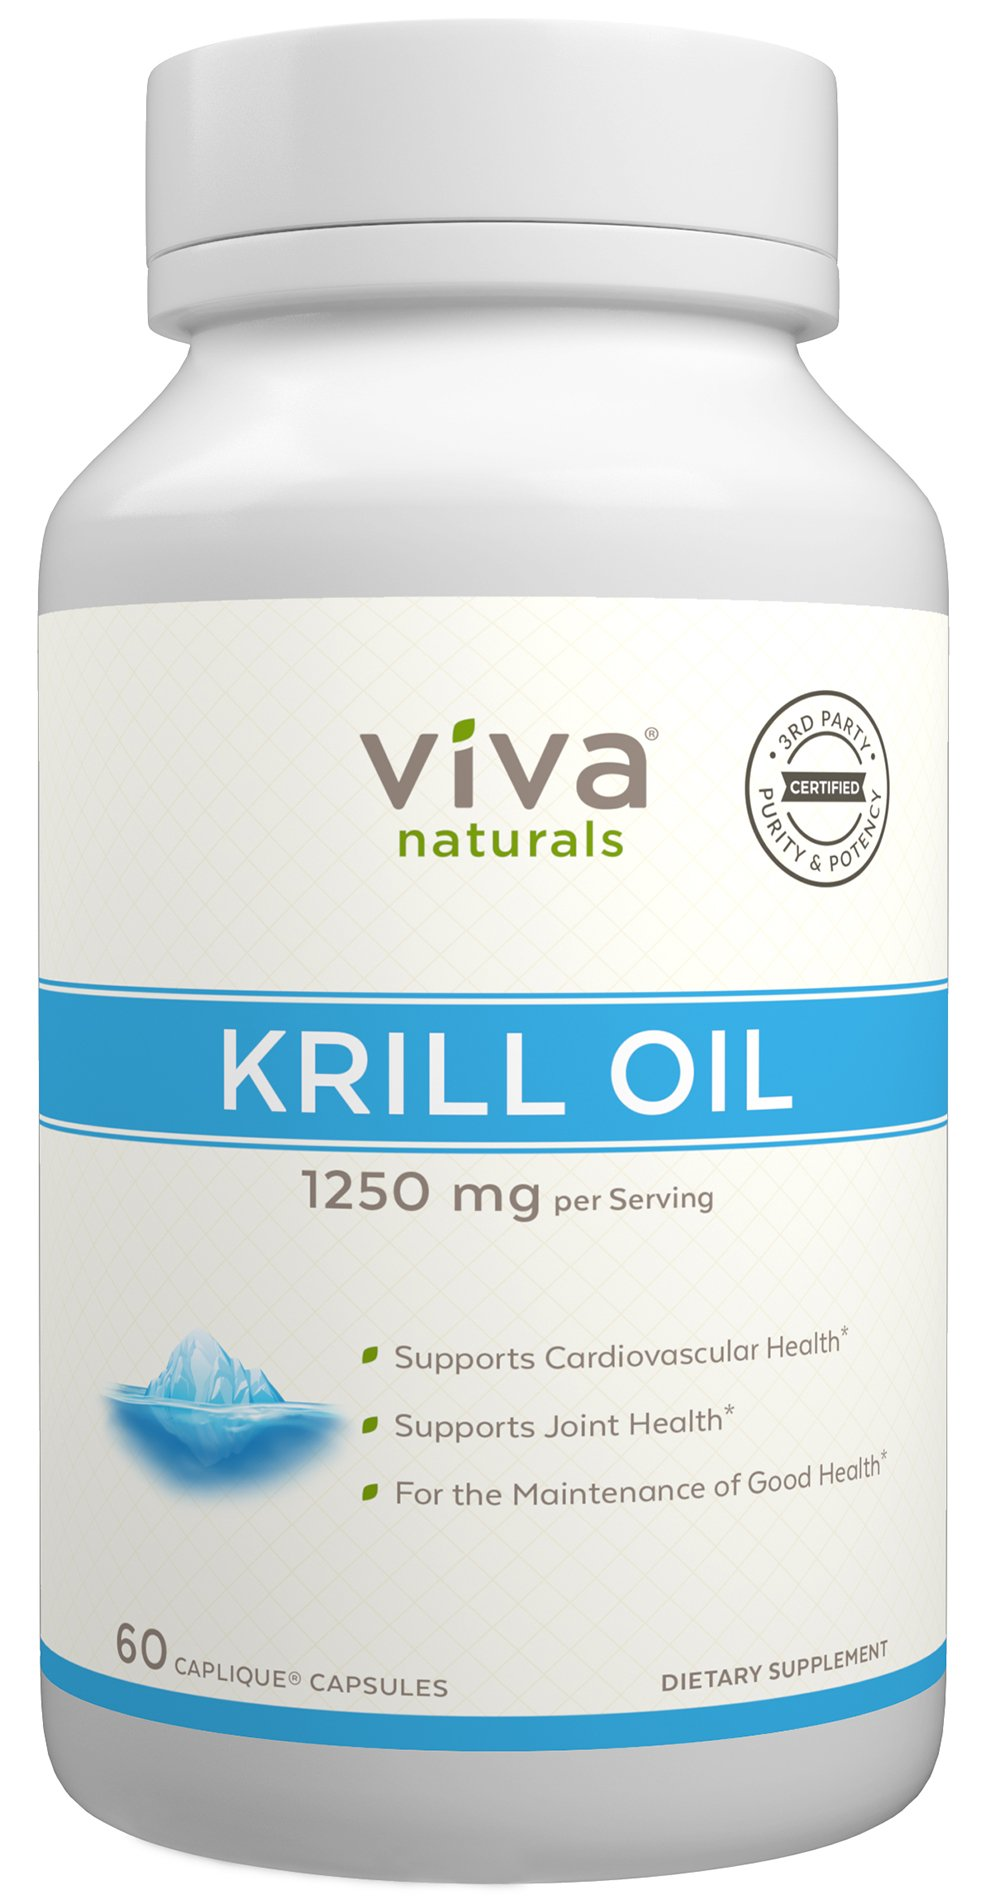 Viva Naturals Krill Oil - 6 Bottles (360 Capliques) by Viva Naturals (Image #1)